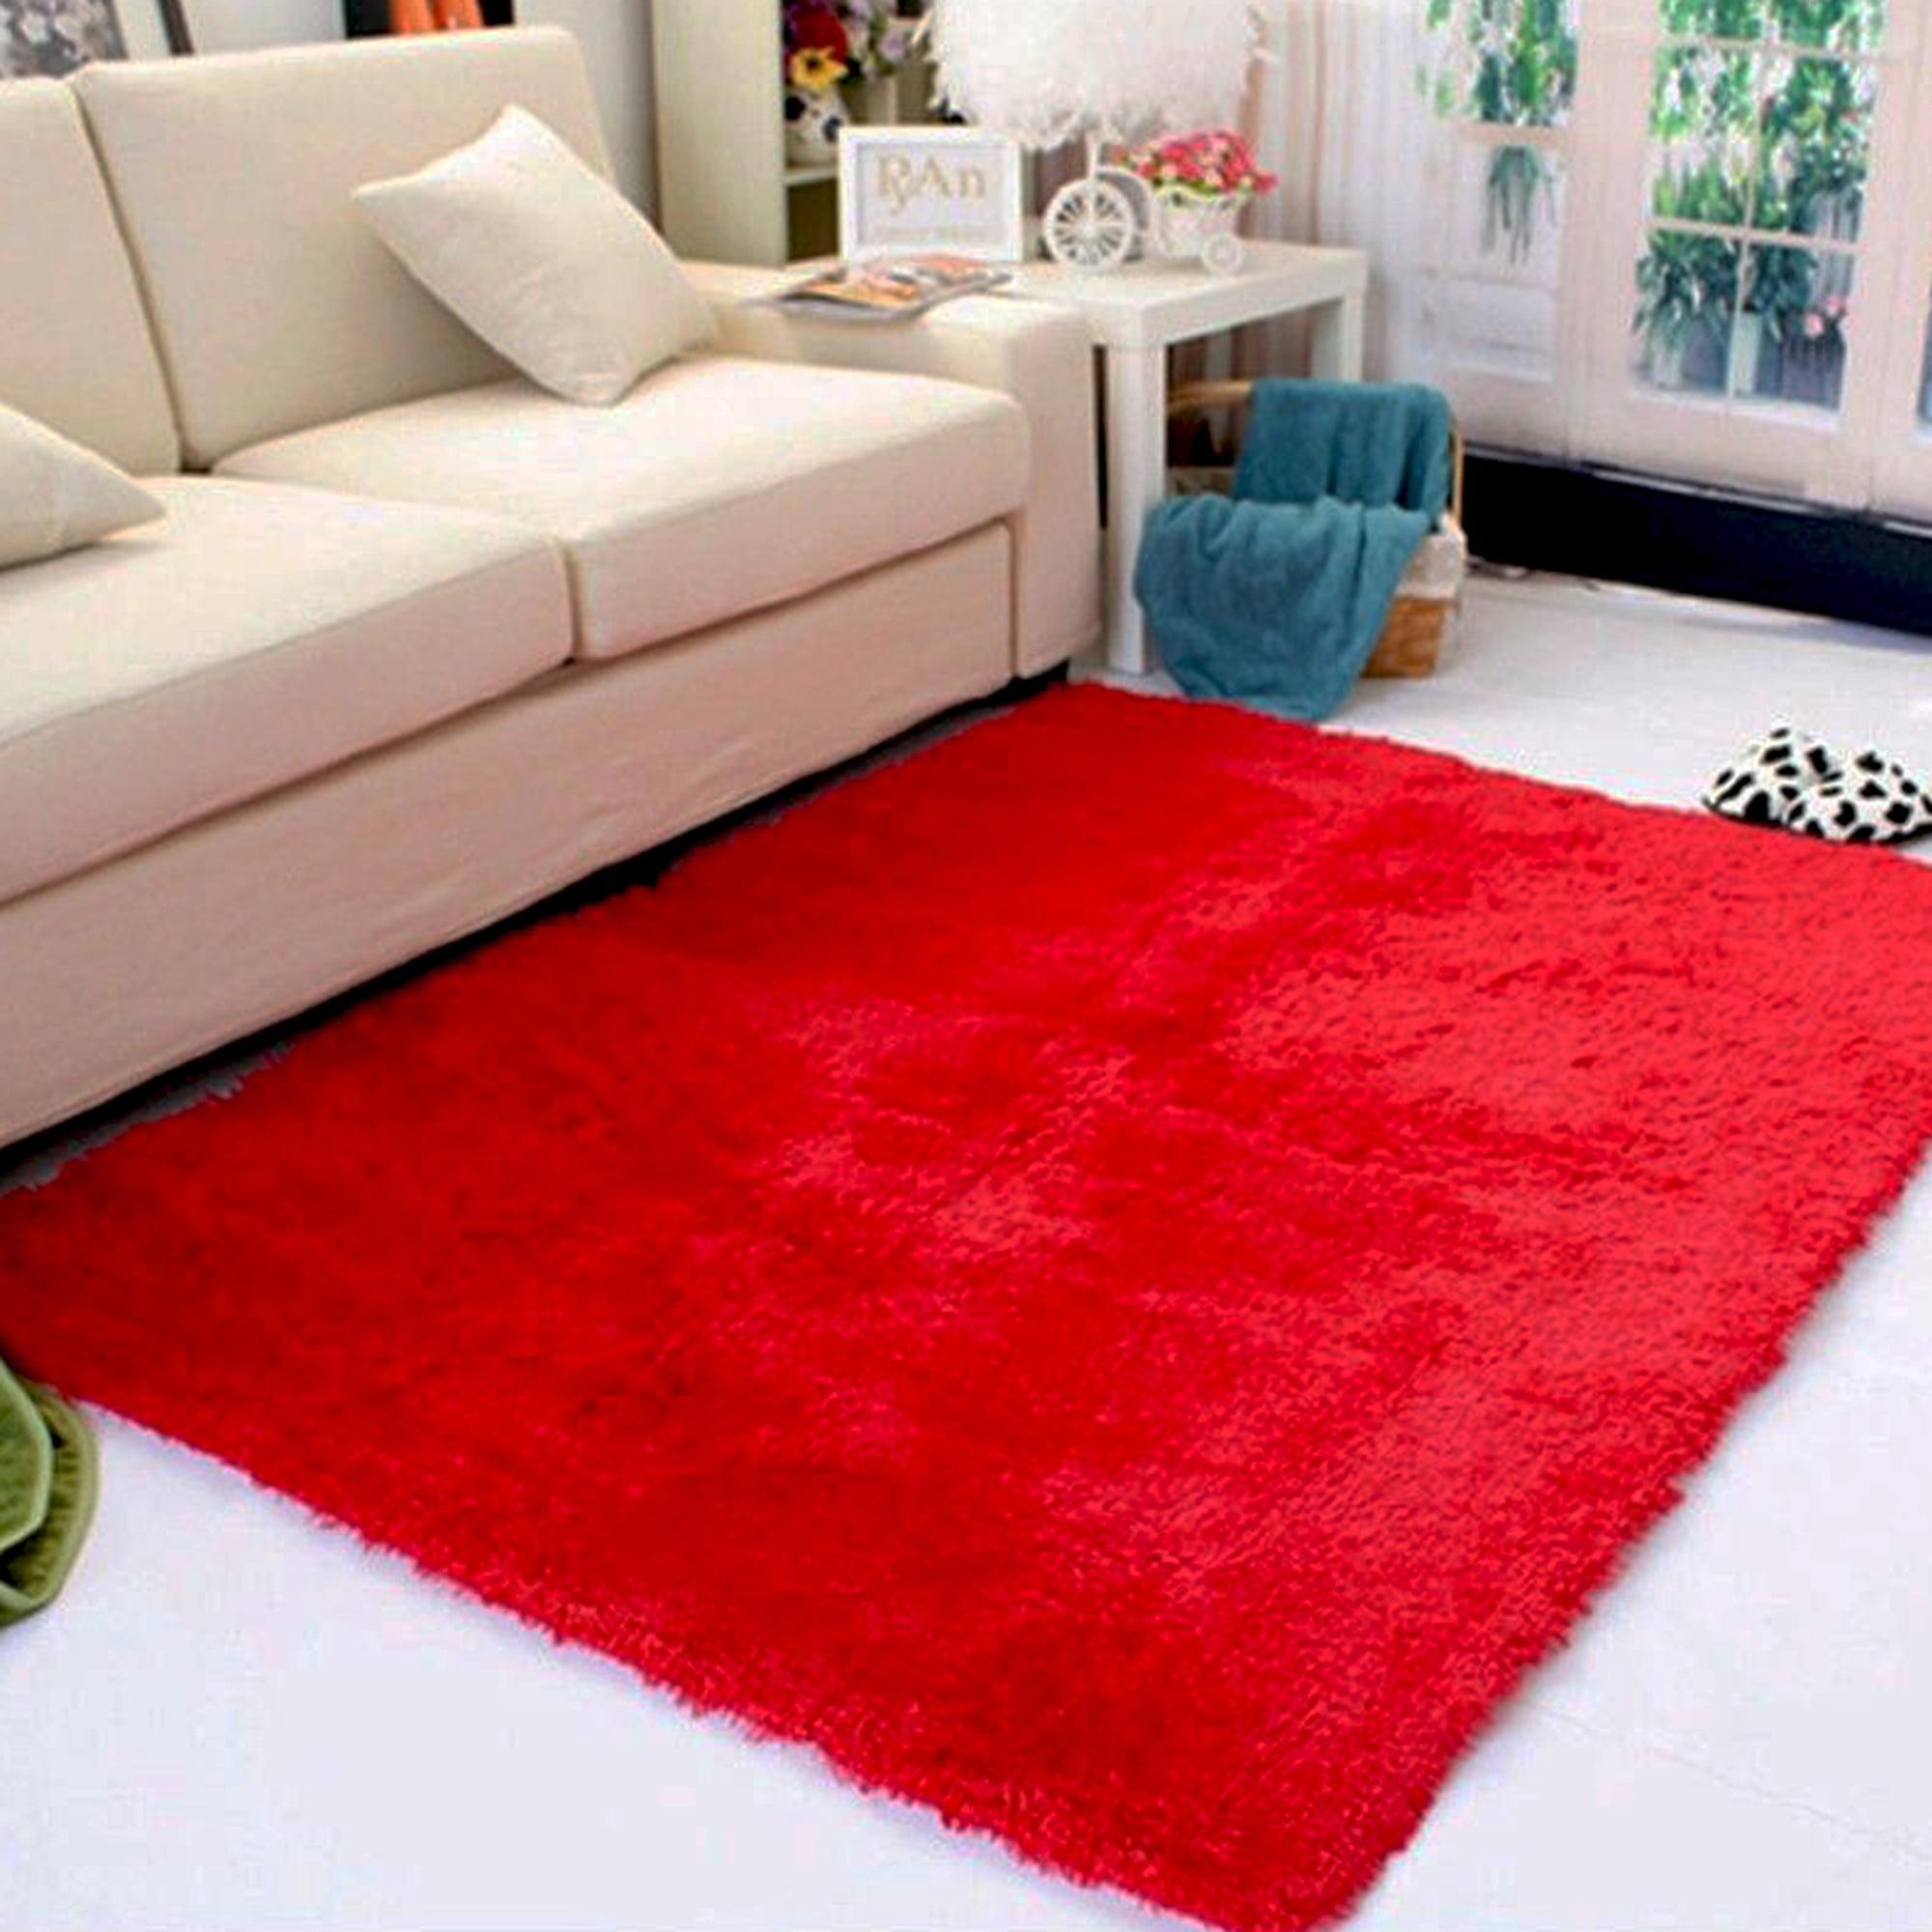 Home Floor Fluffy Rugs Anti-Slip Shaggy Fashion Super Soft Carpet Mat Decoration